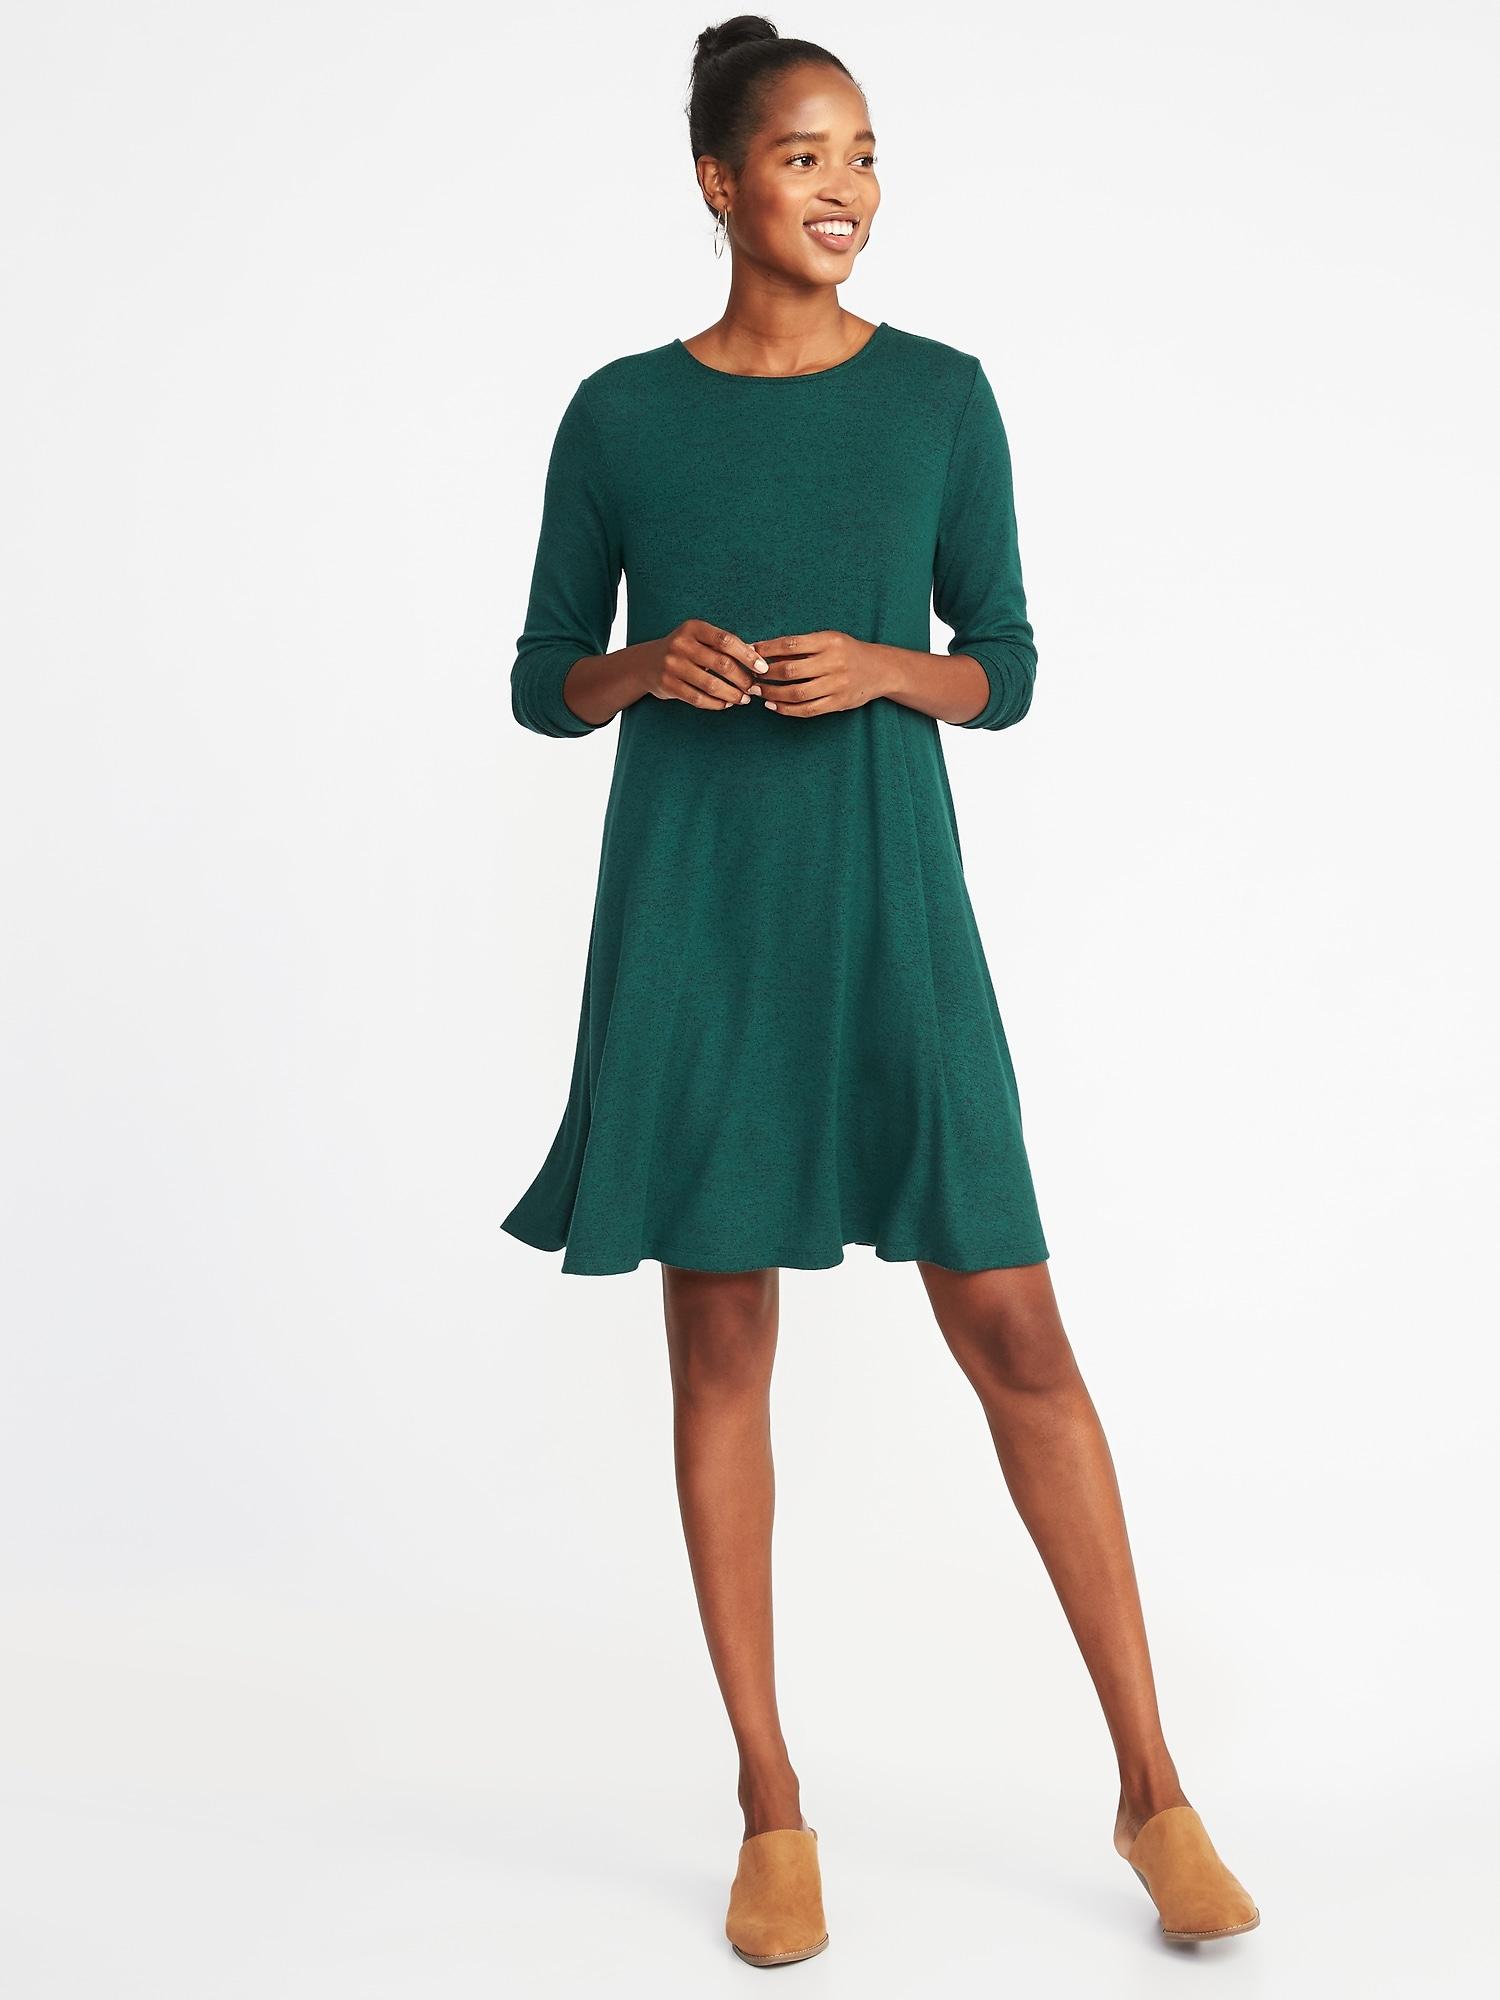 657c92ae06 Plush-Knit Swing Dress for Women